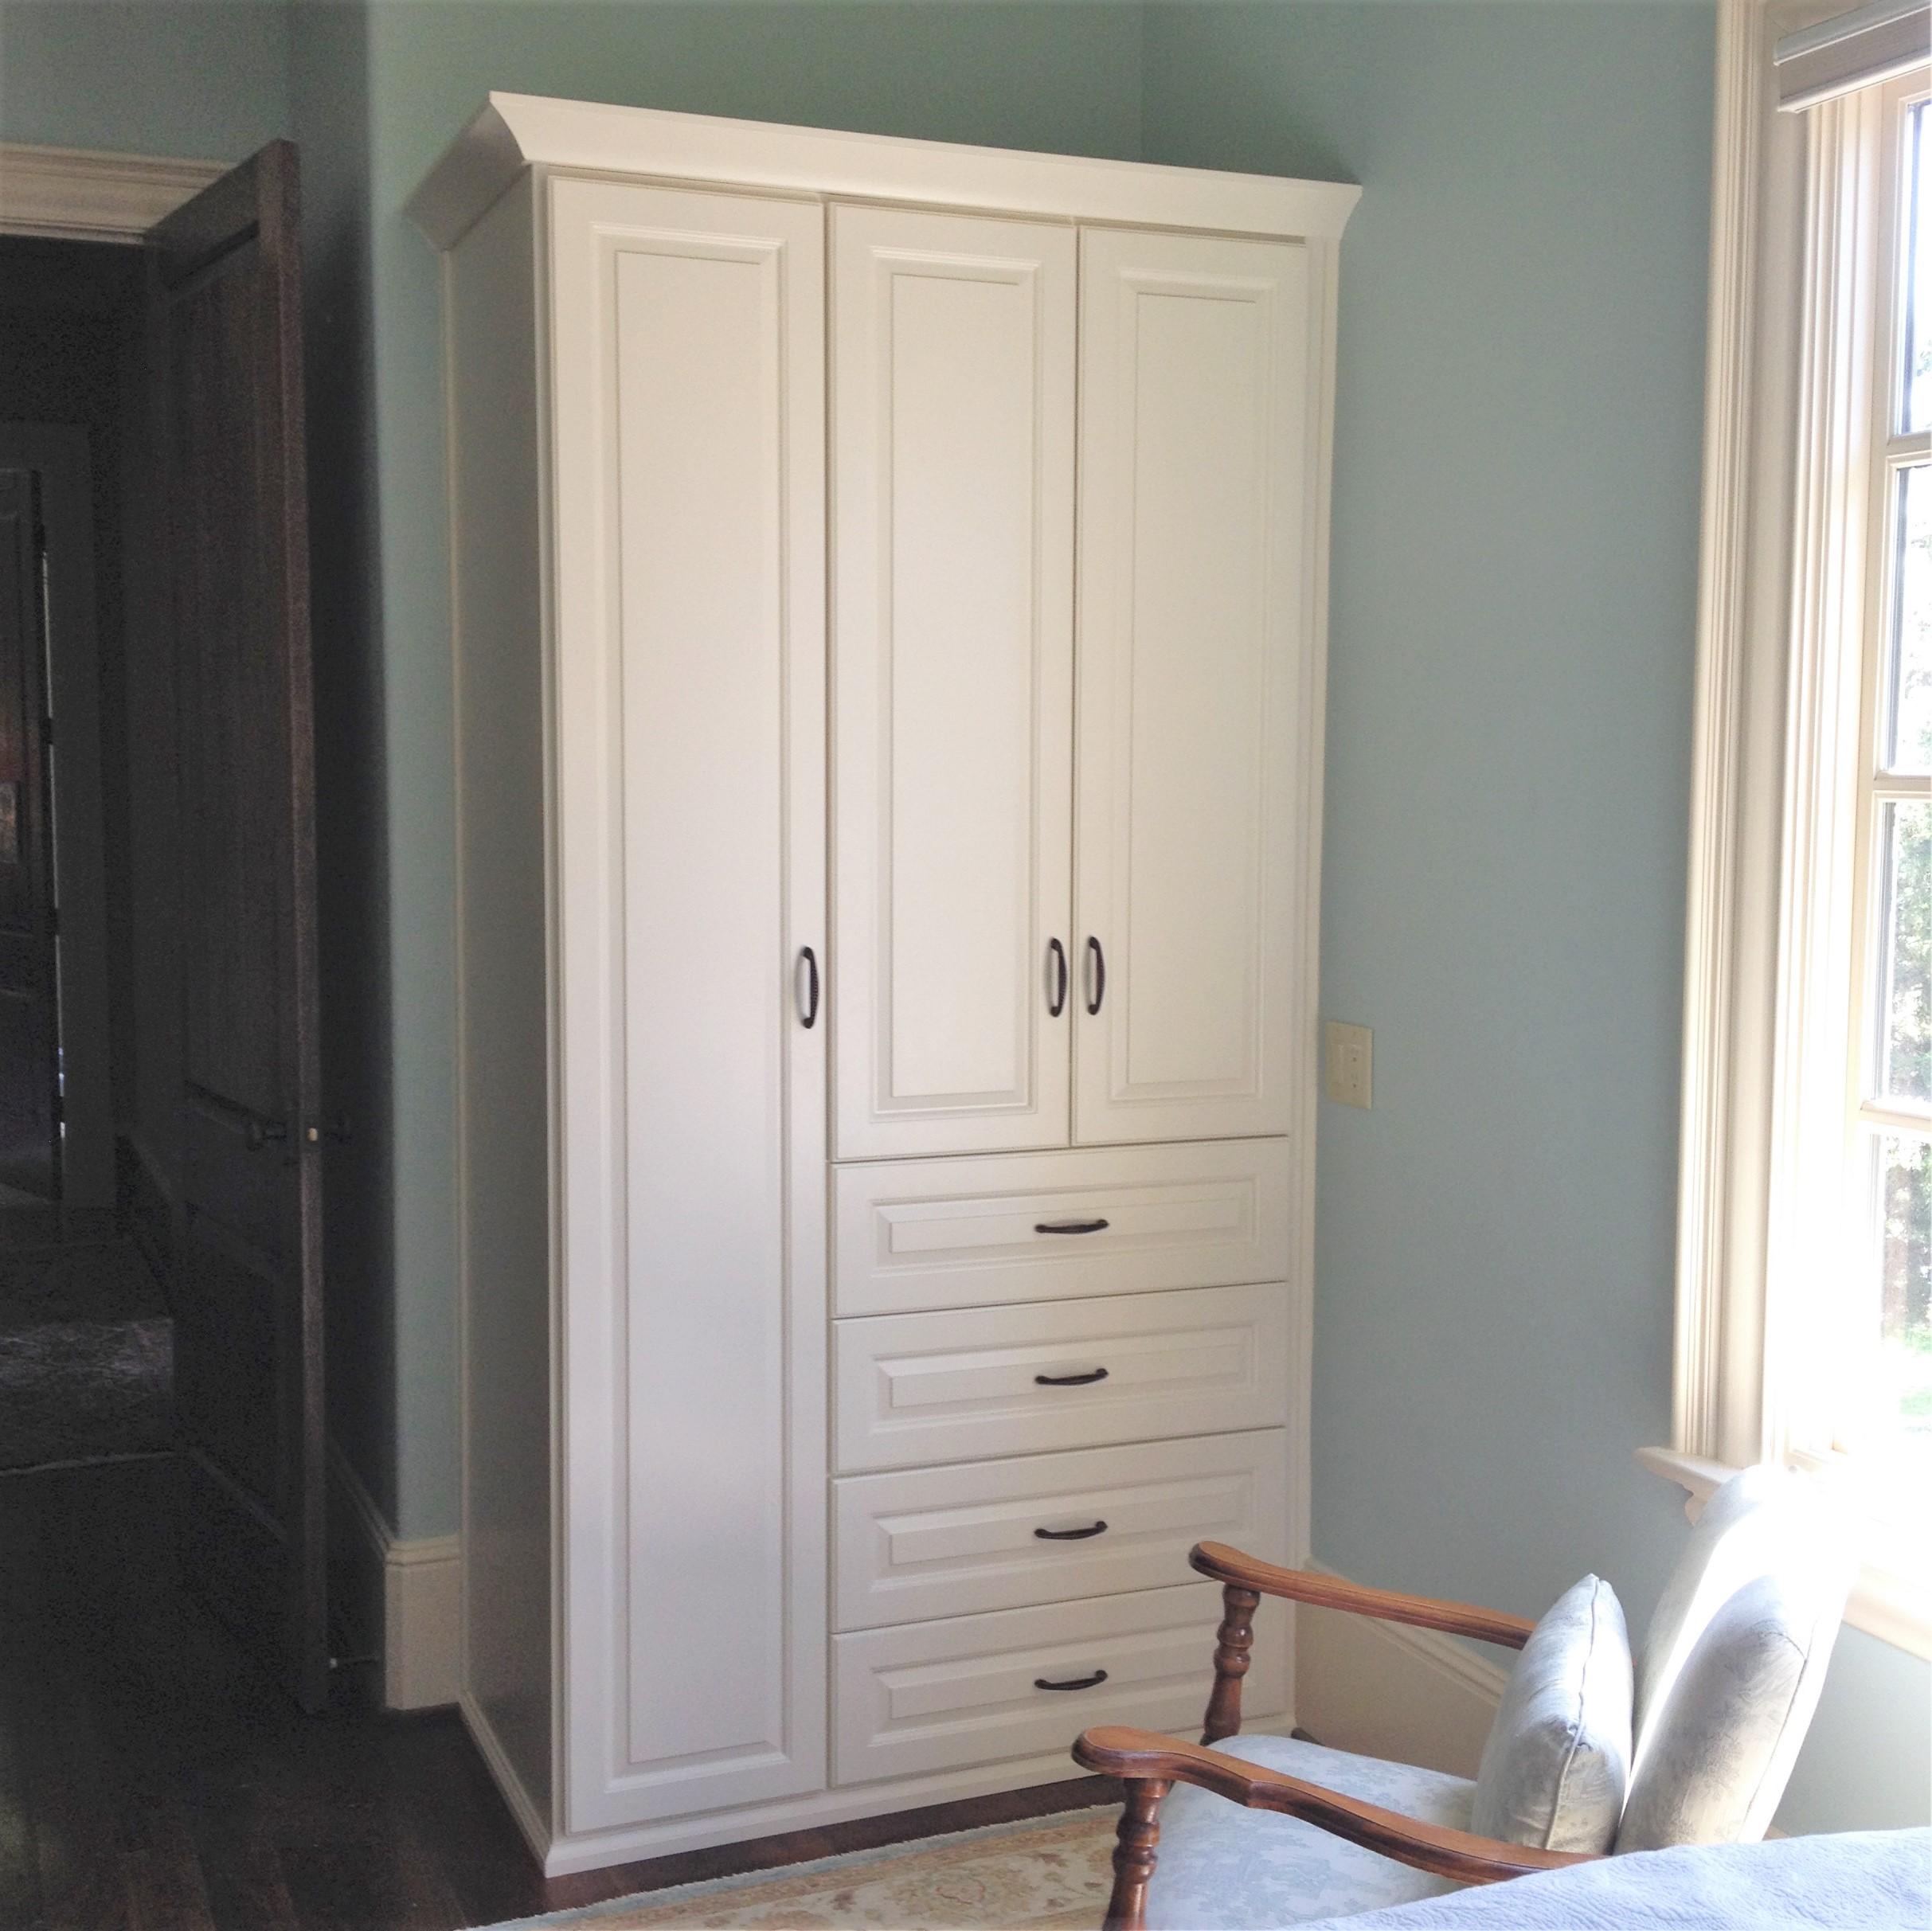 Guest Bedroom Wardrobe - After.JPG